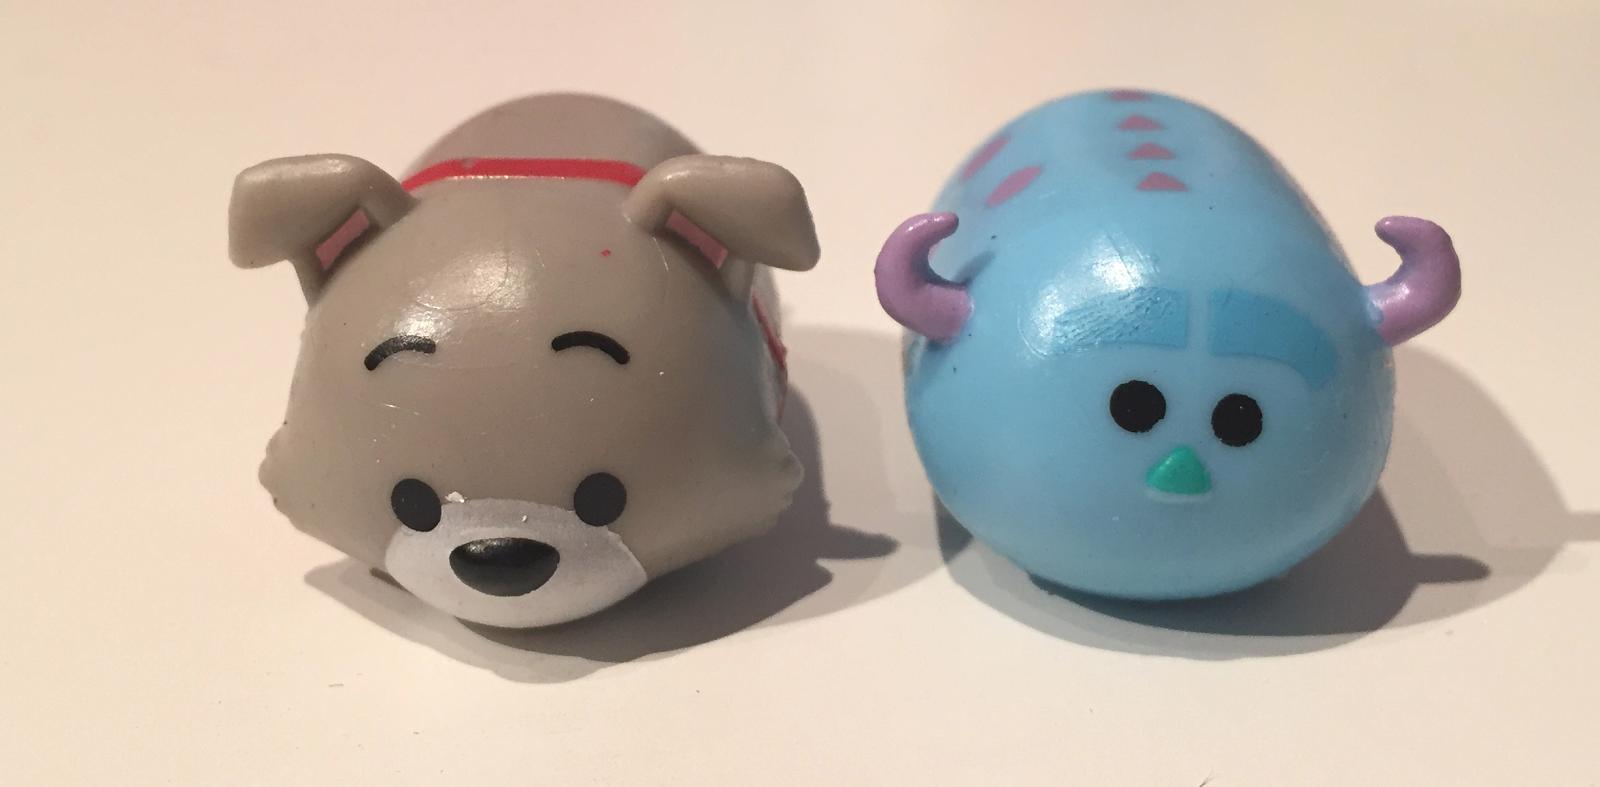 Squishy Toys Asda : Tsum Tsum Squishy VictoriaJanex - UK Blog